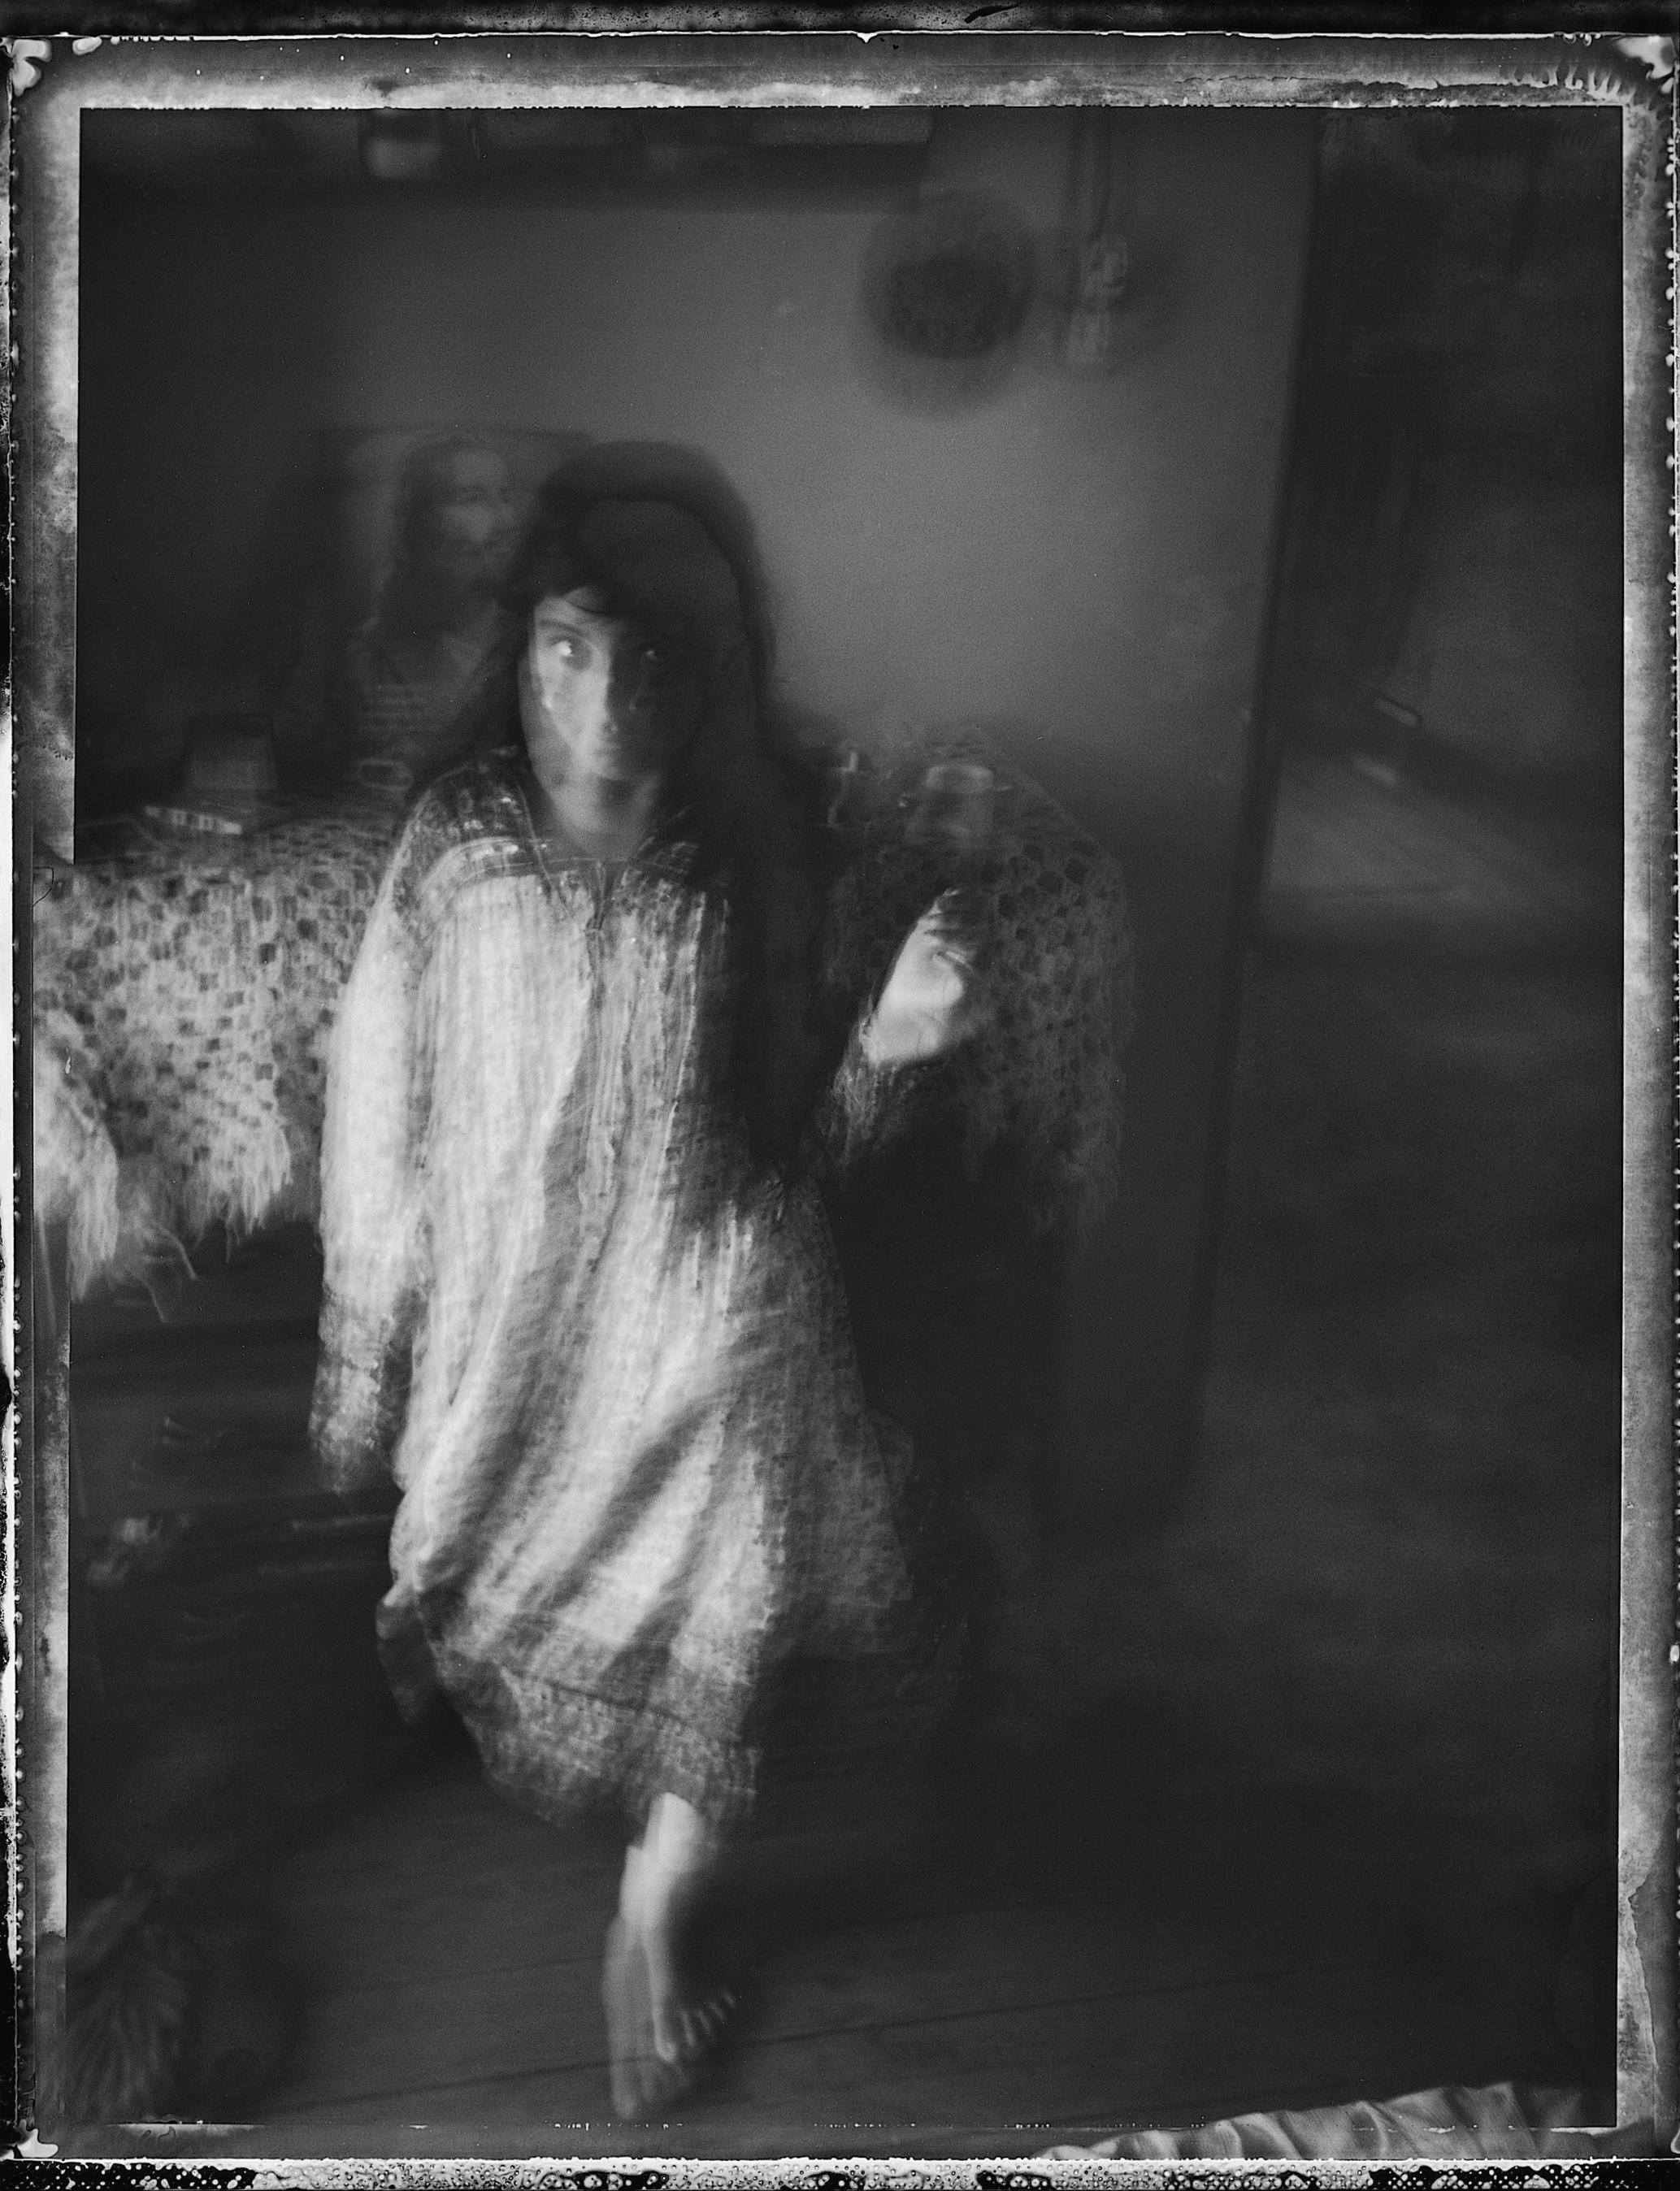 "©Wendy Ewald Courtesy Steven Kasher Gallery, New York,""The phantom"" - Teresa López, Mexico, 1991"